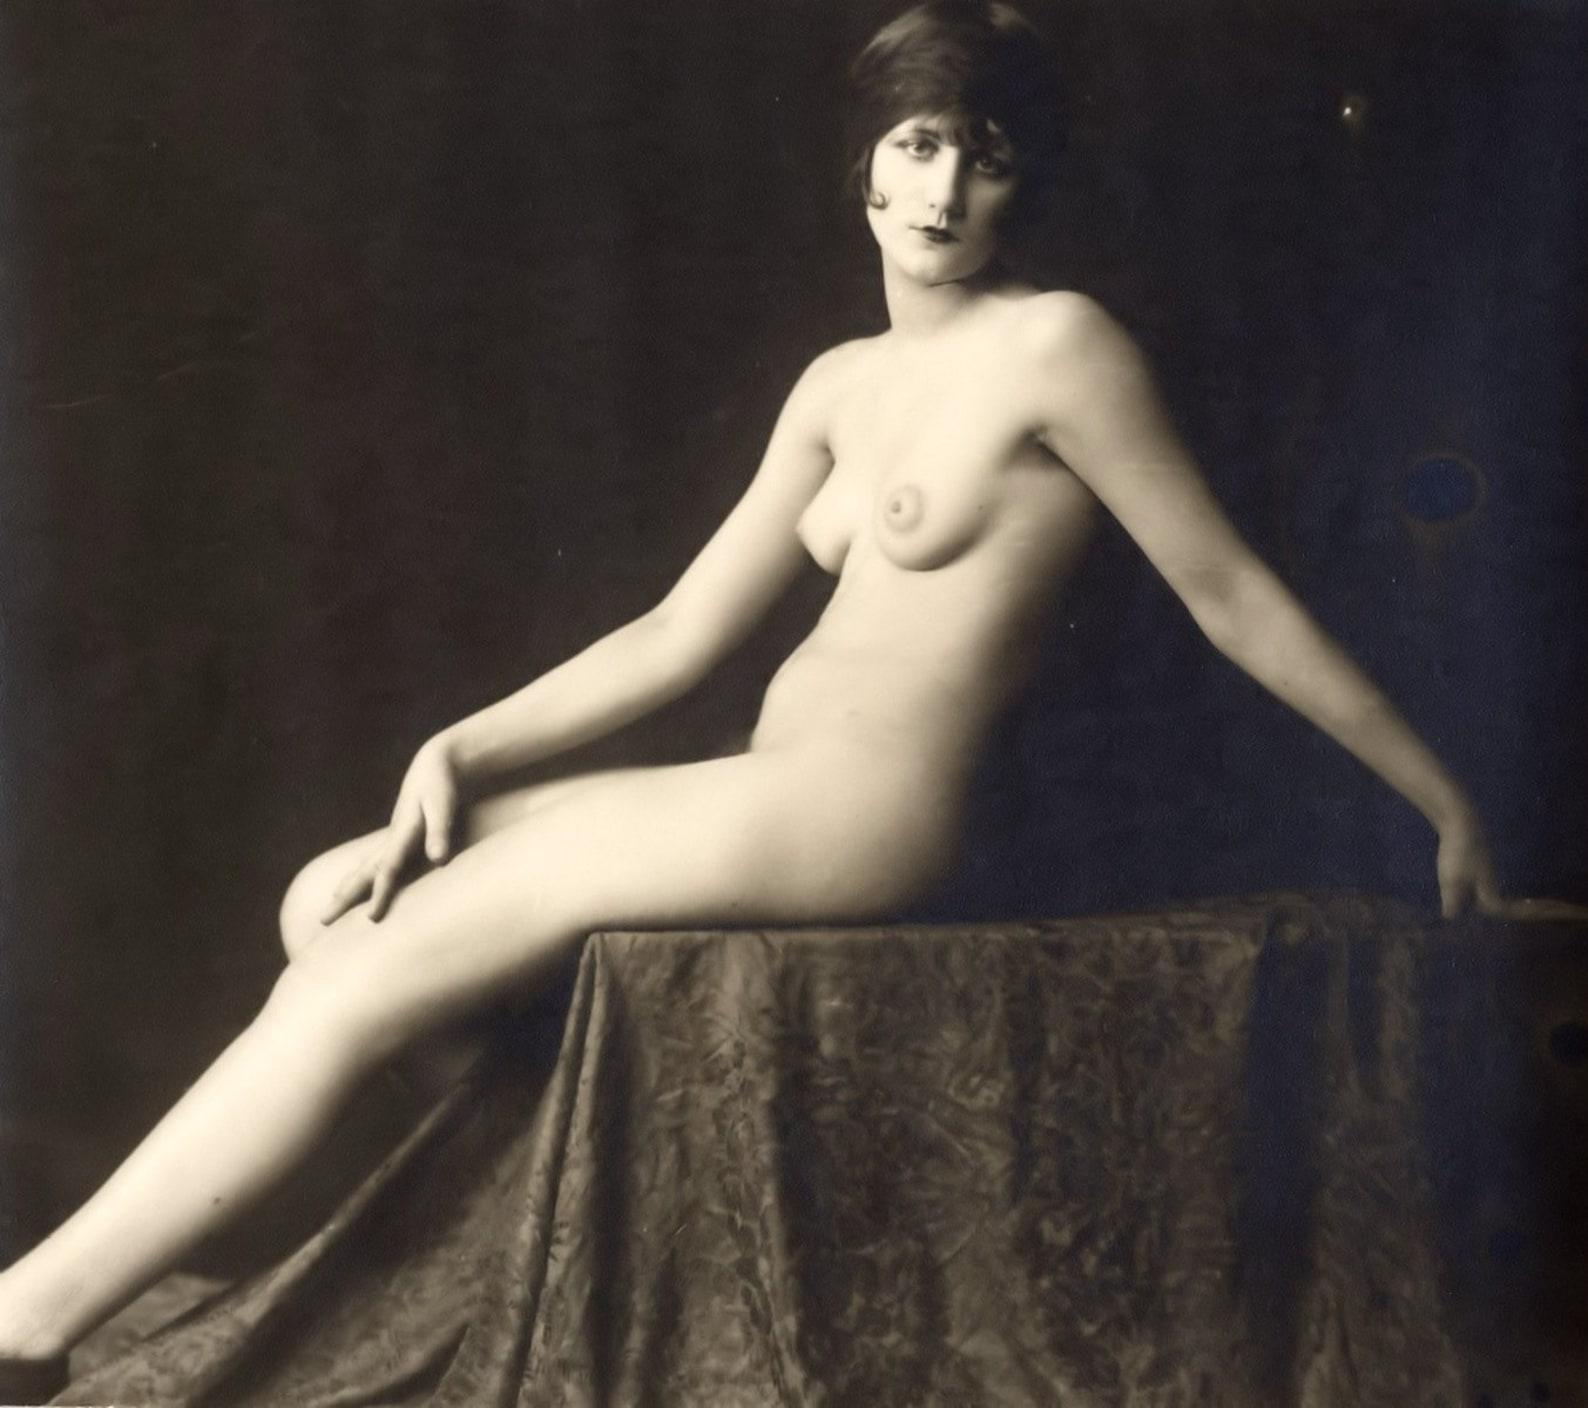 Pretty naked women by freexcafe